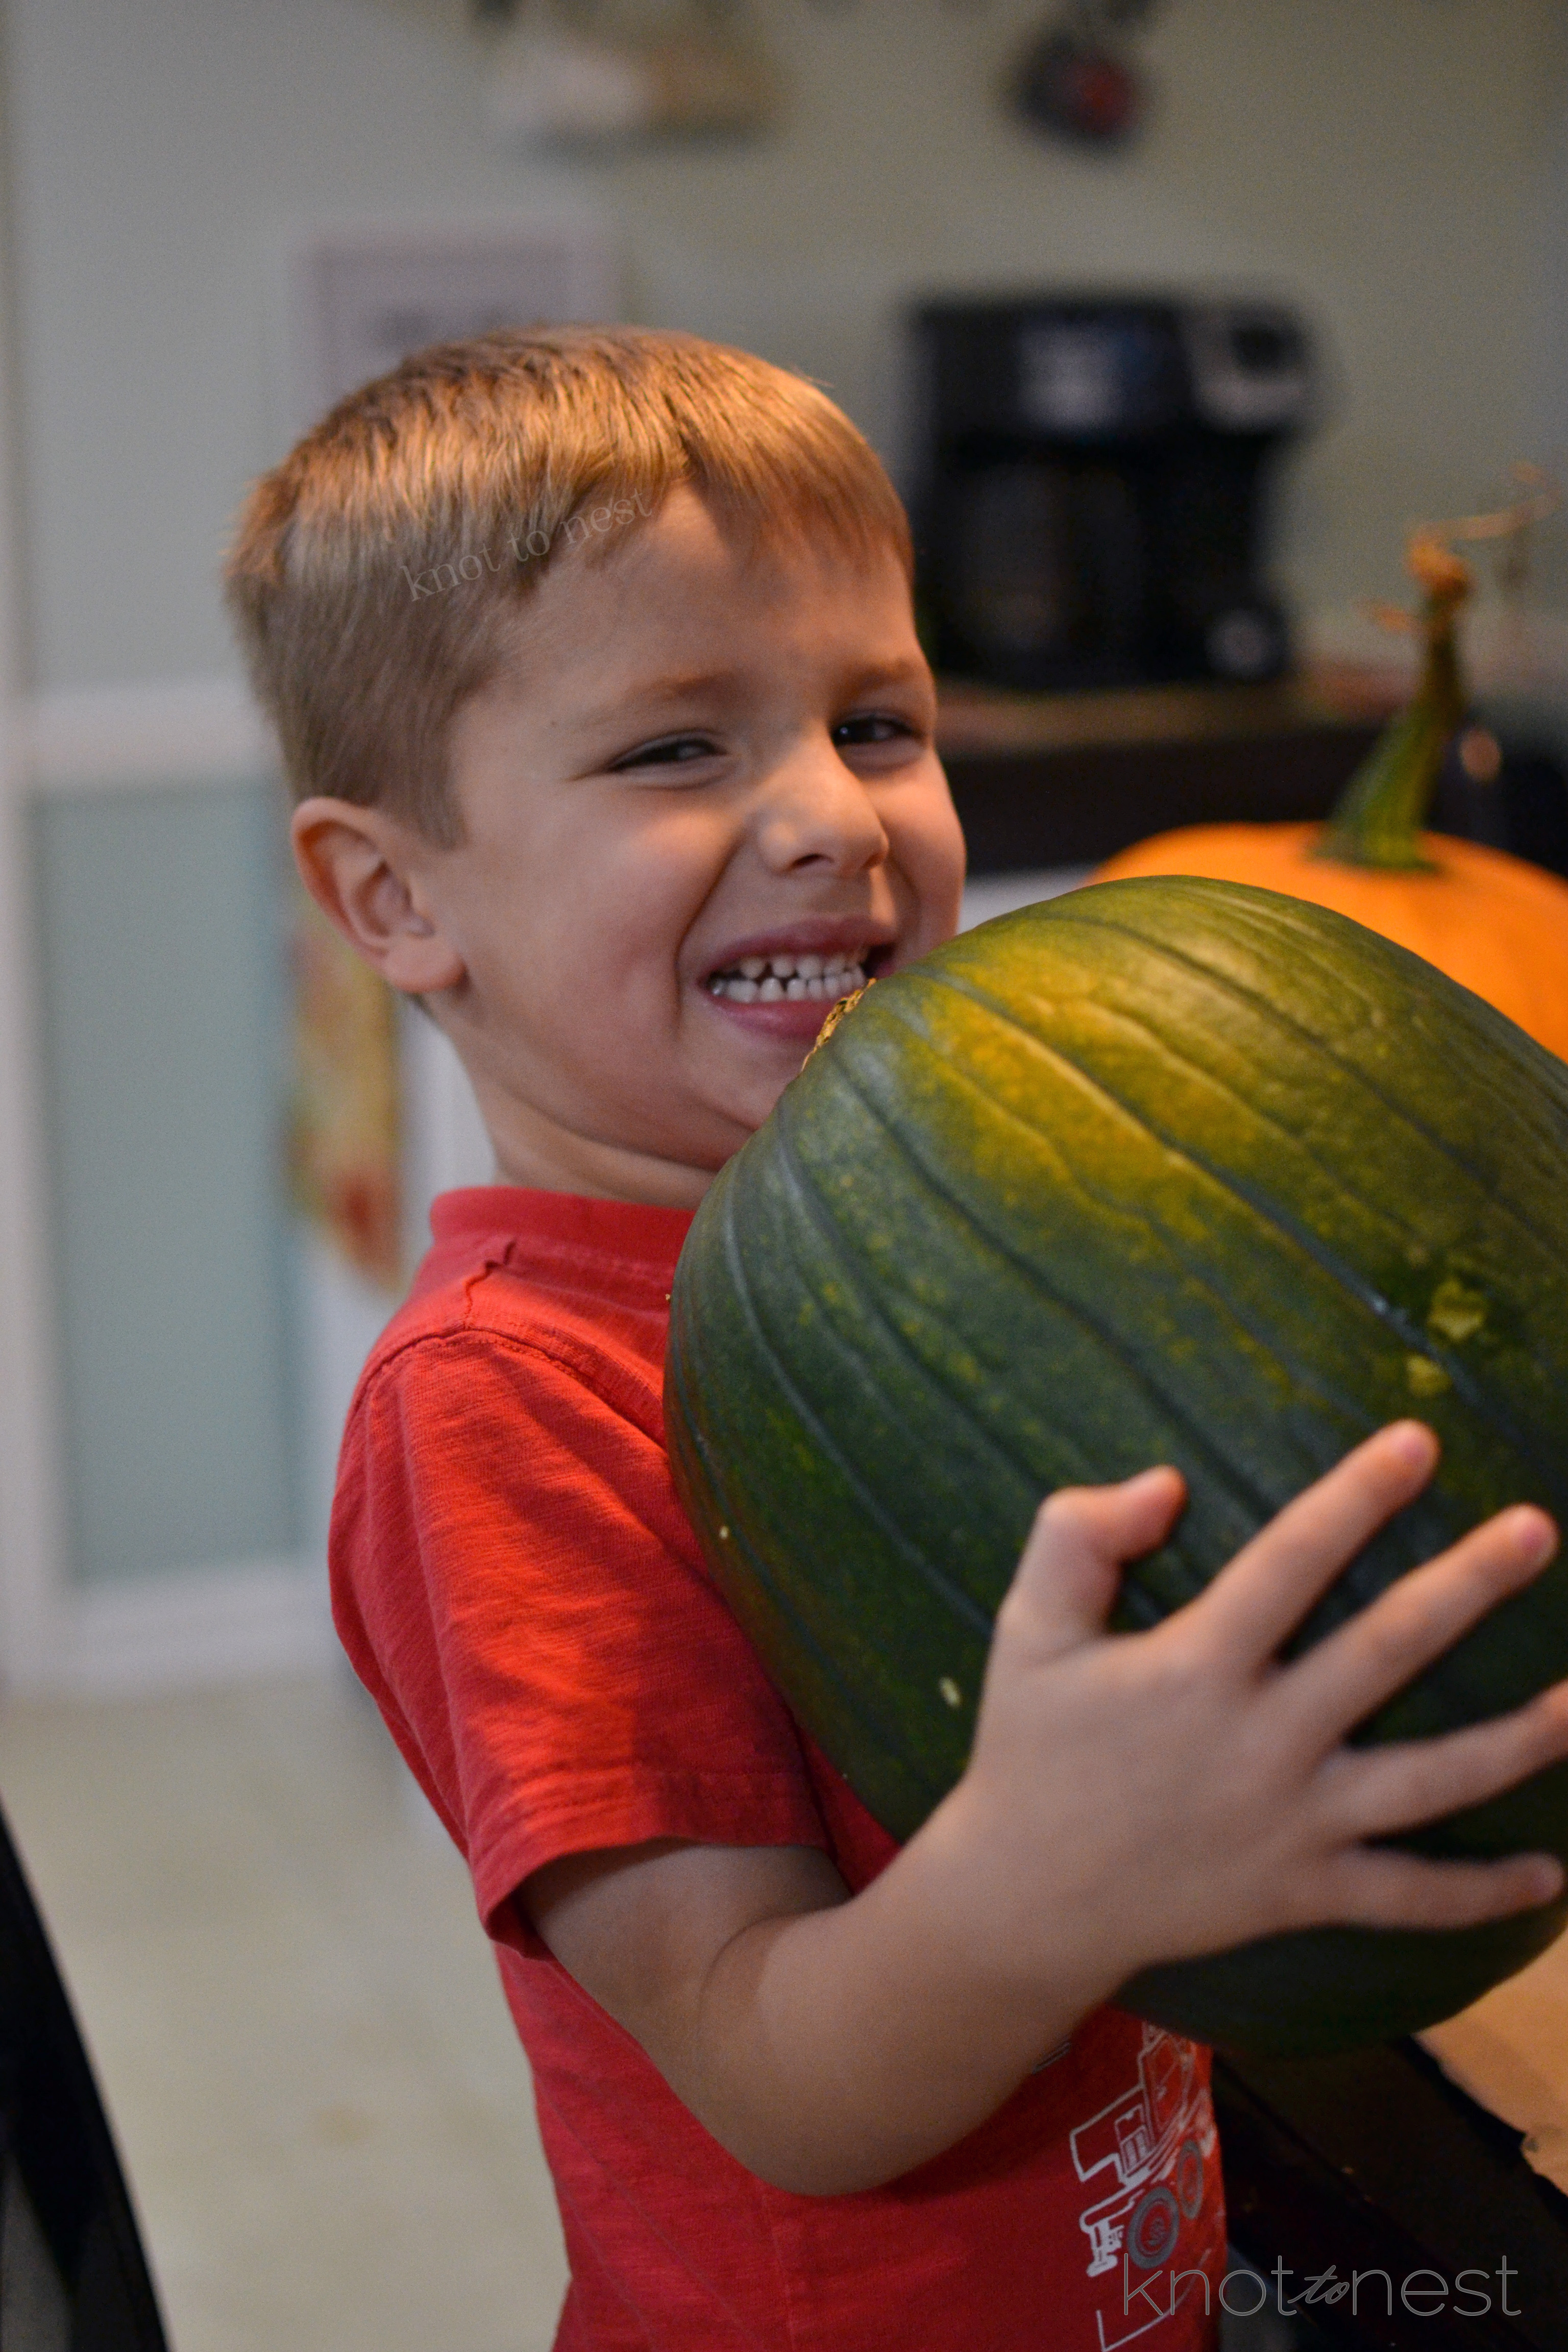 carving a green pumpking